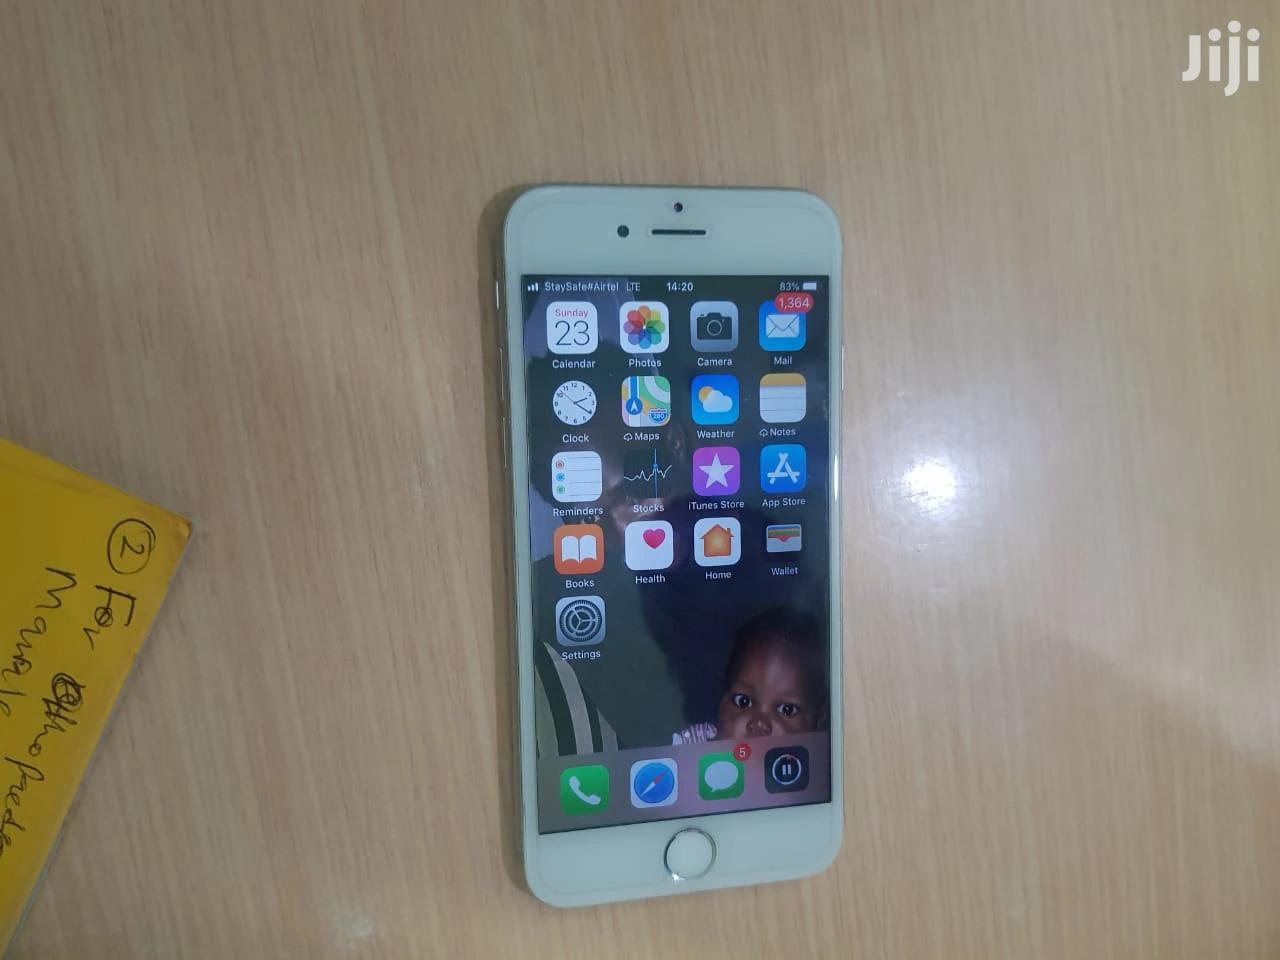 Apple iPhone 6 16 GB Silver   Mobile Phones for sale in Changamwe, Mombasa, Kenya